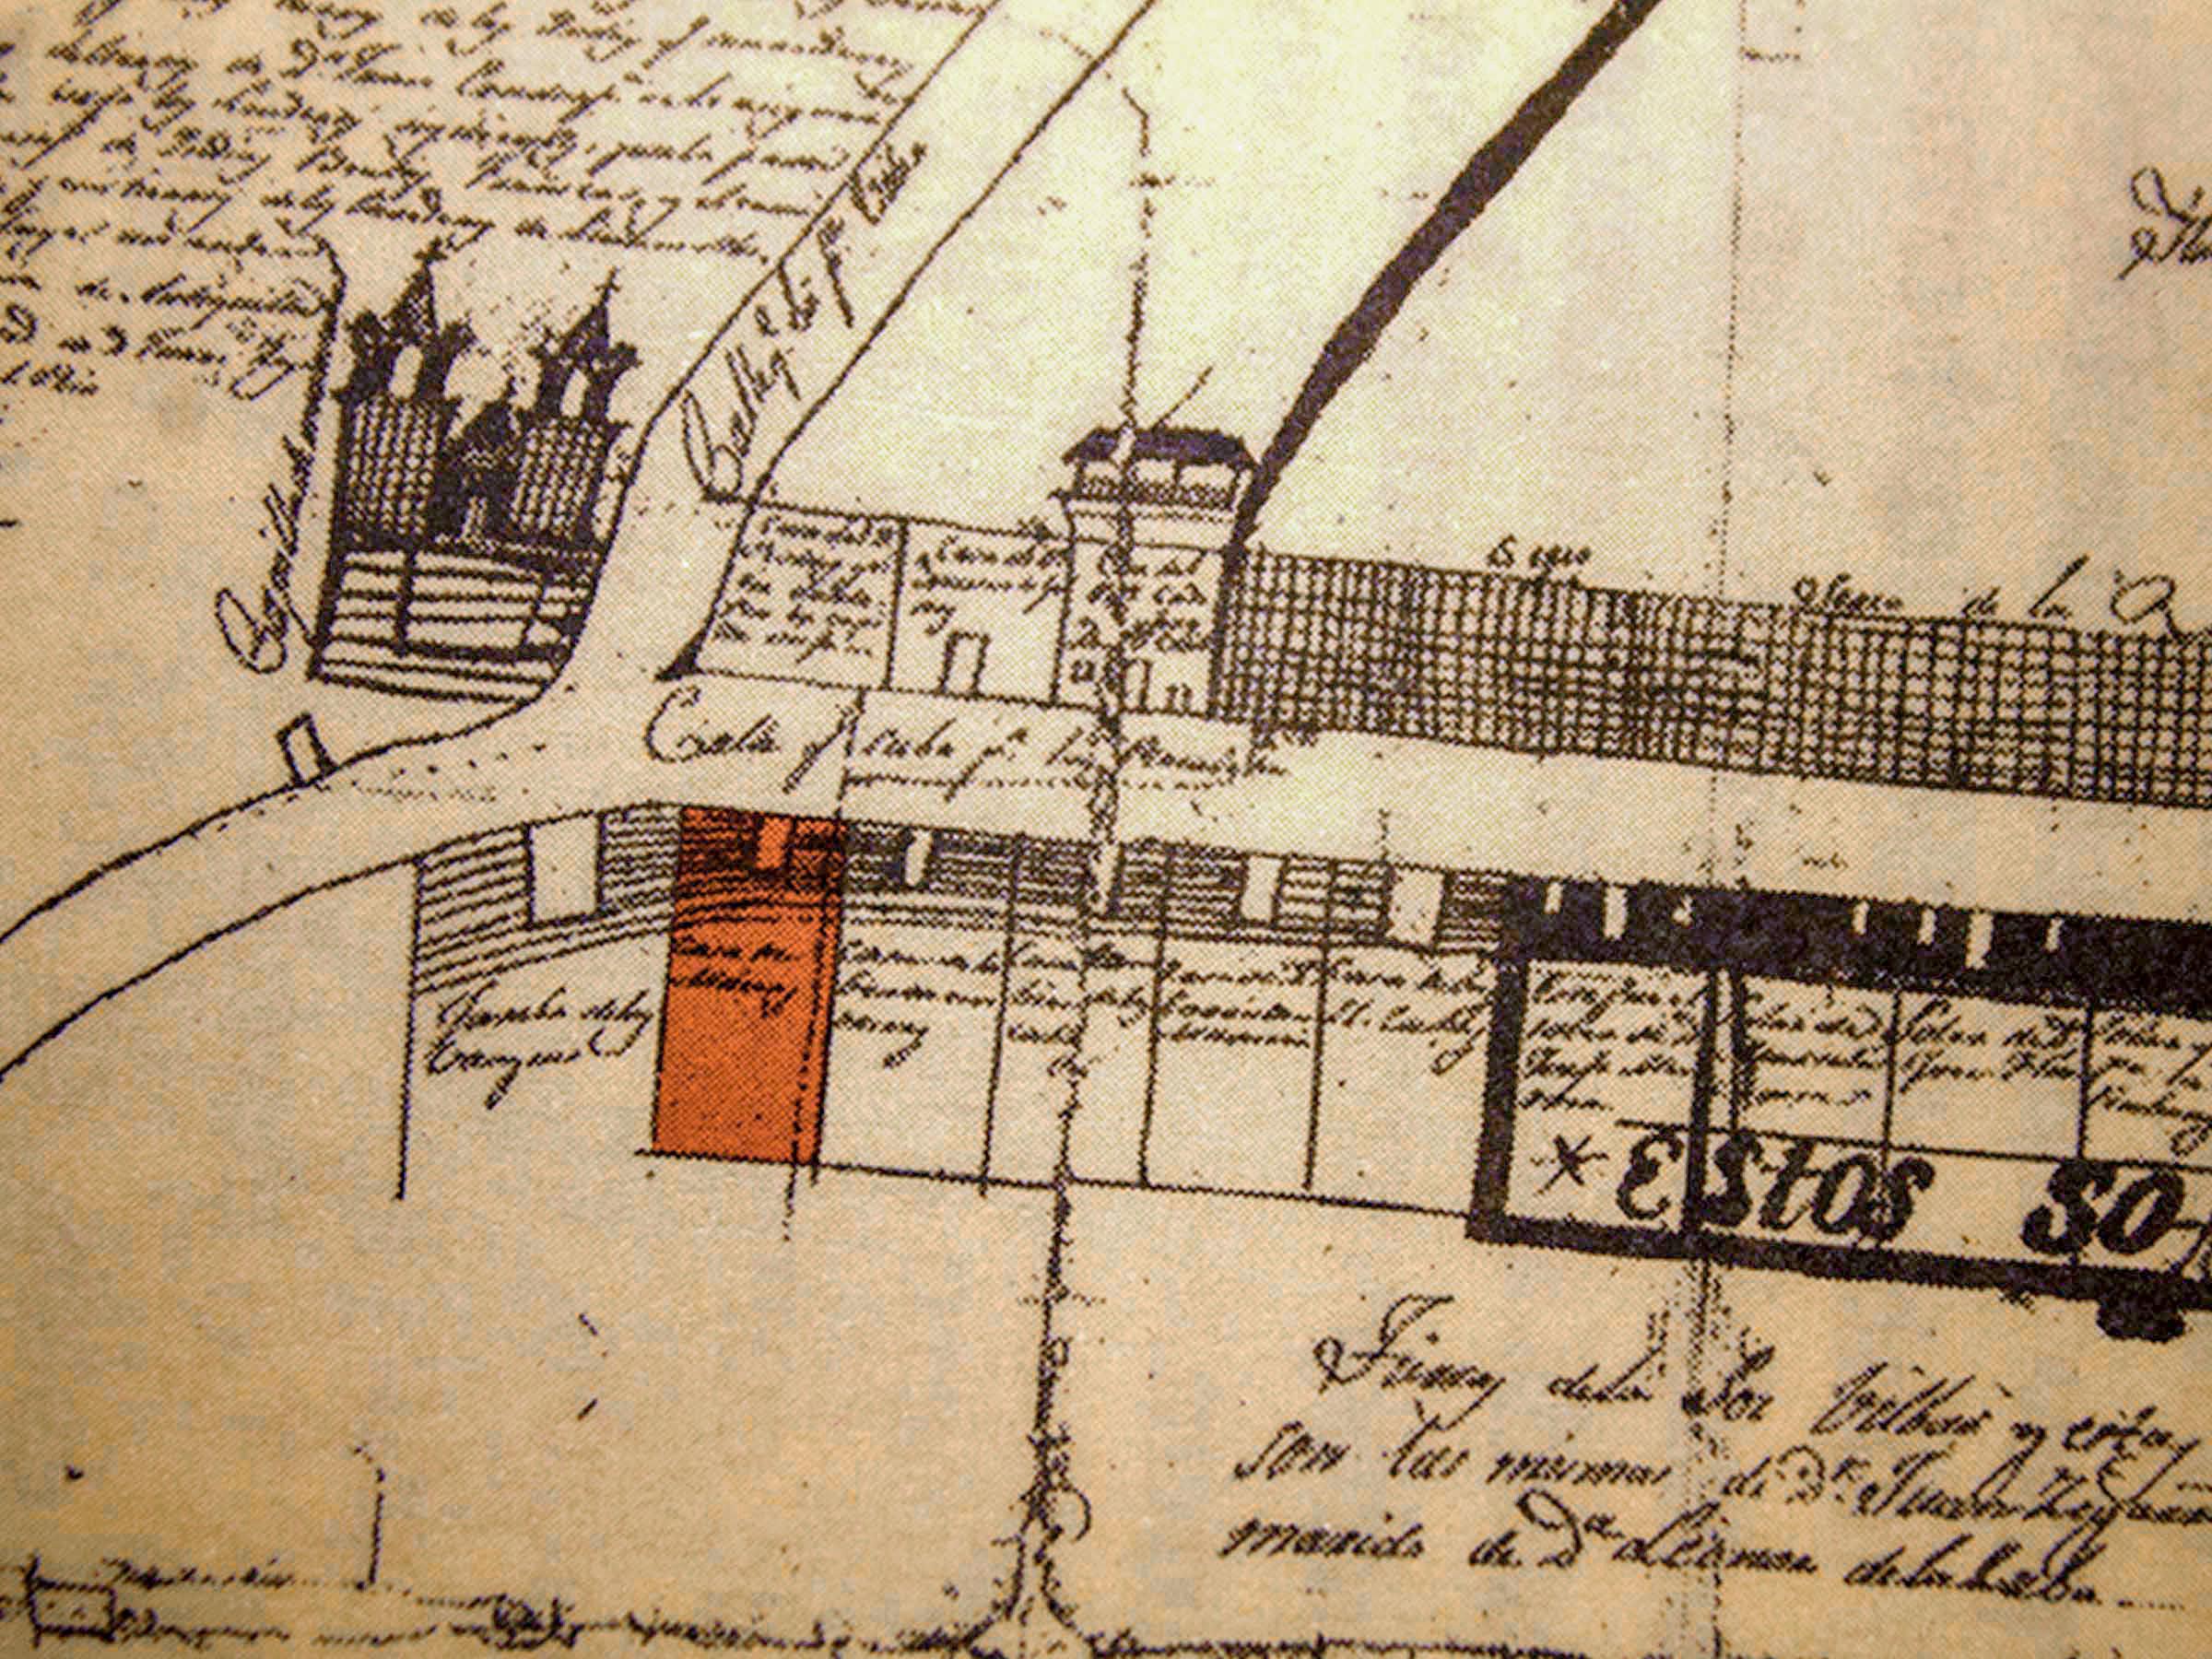 Plano ubicacion acolpacha 1920